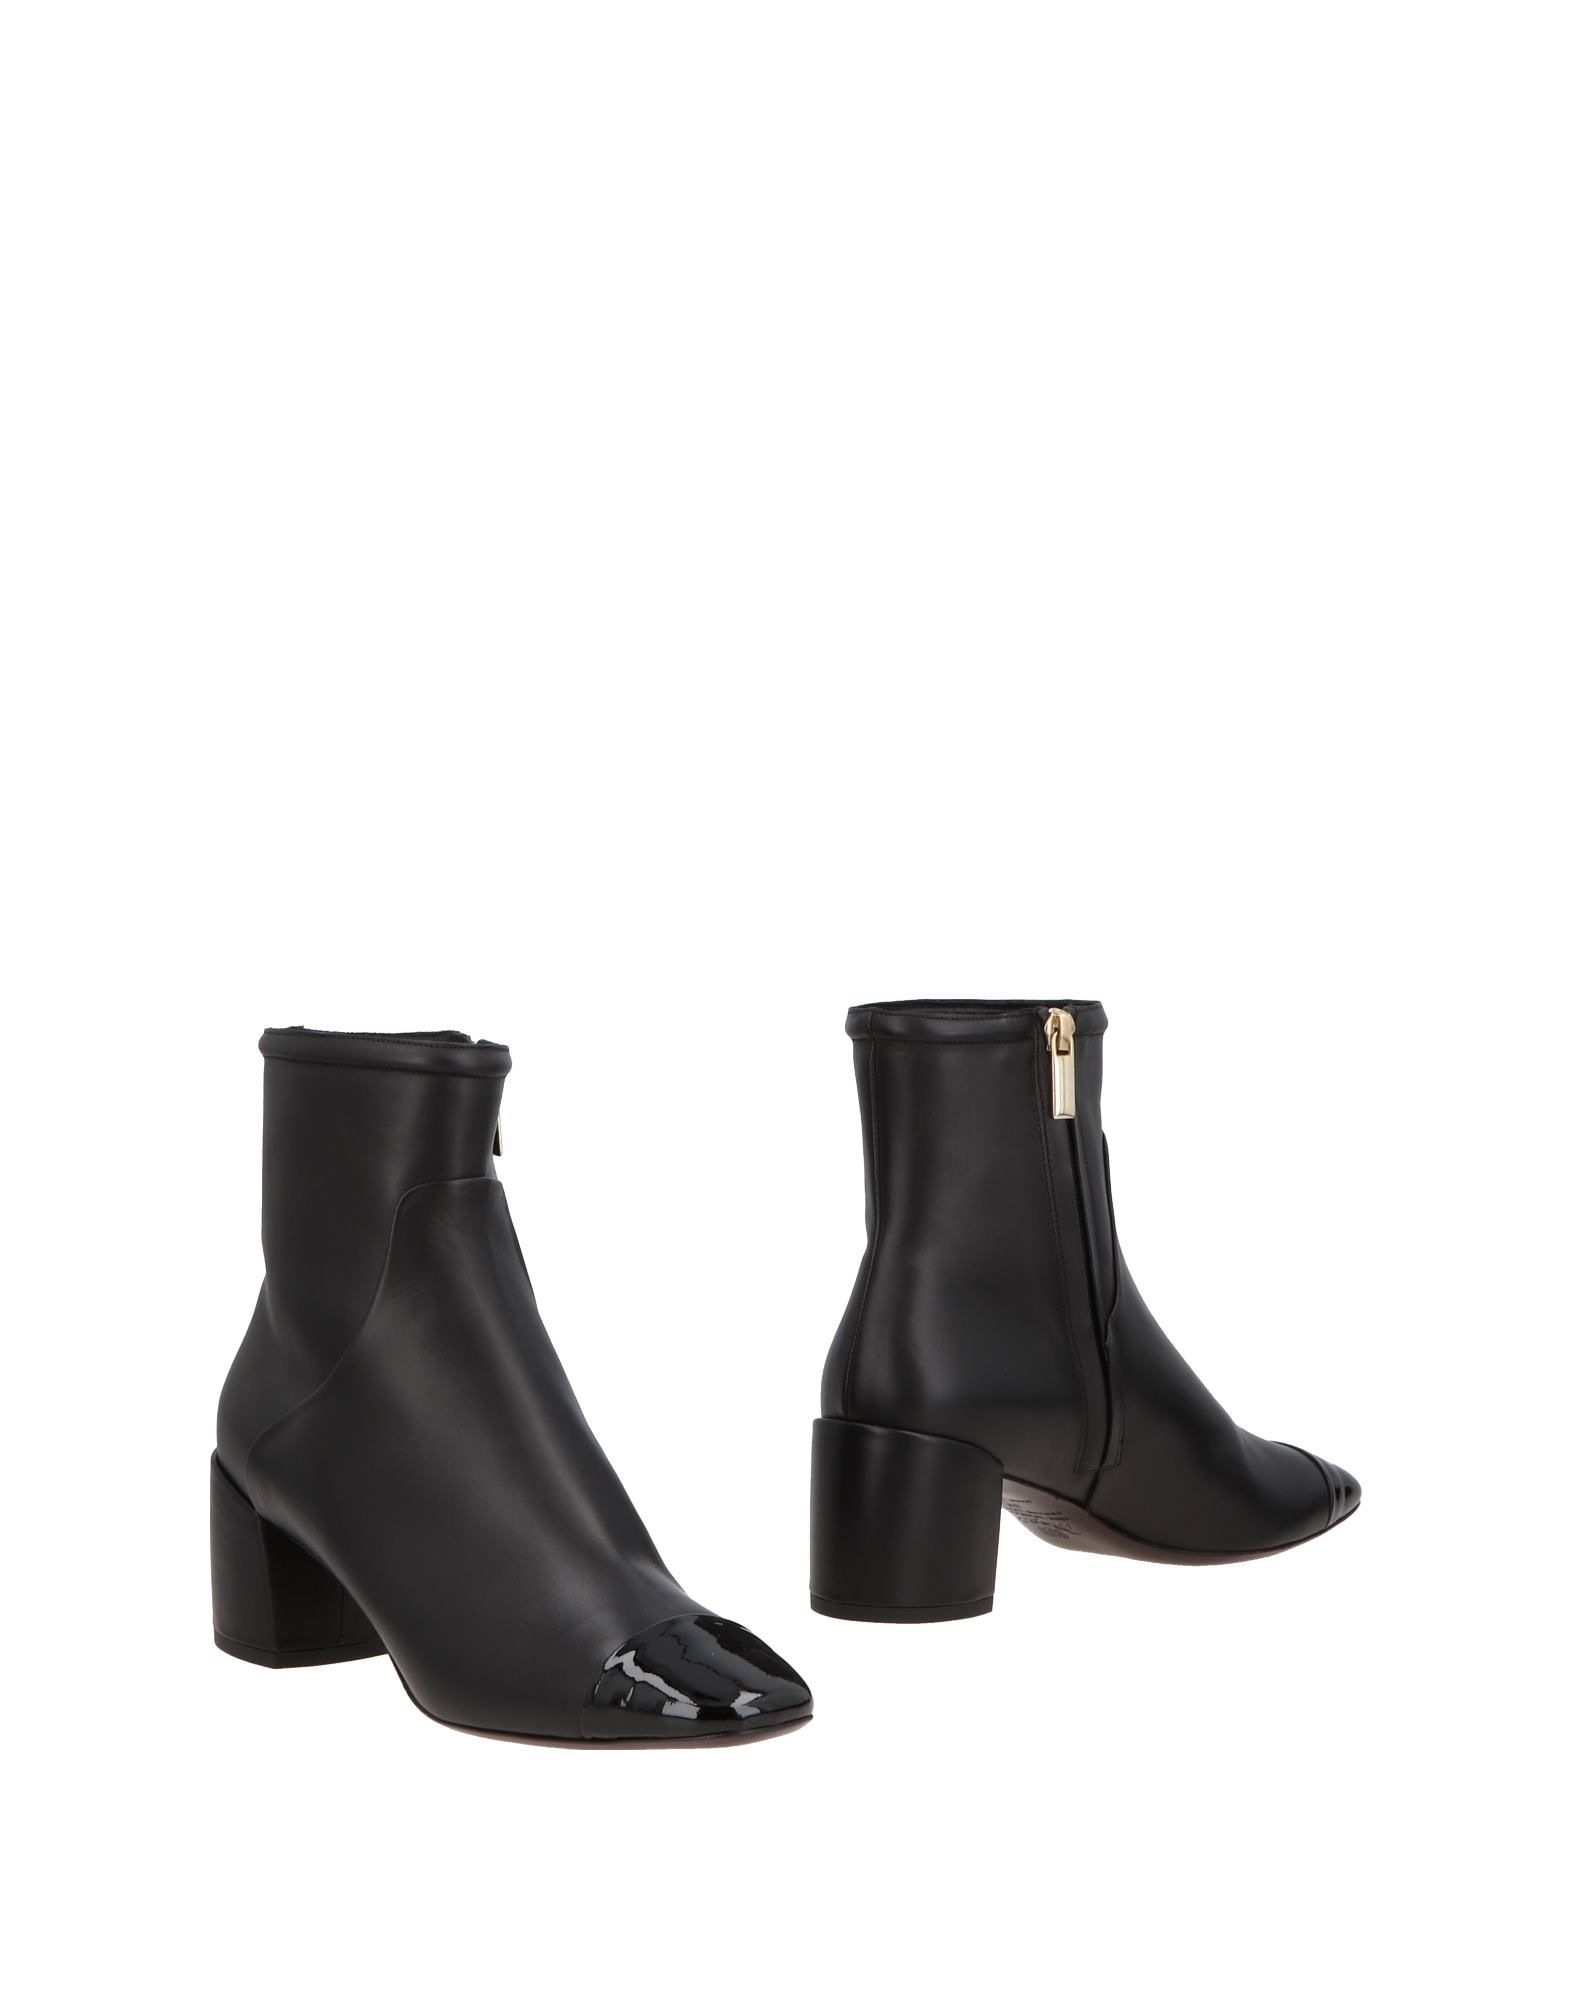 MAGLI by BRUNO MAGLI Полусапоги и высокие ботинки цены онлайн